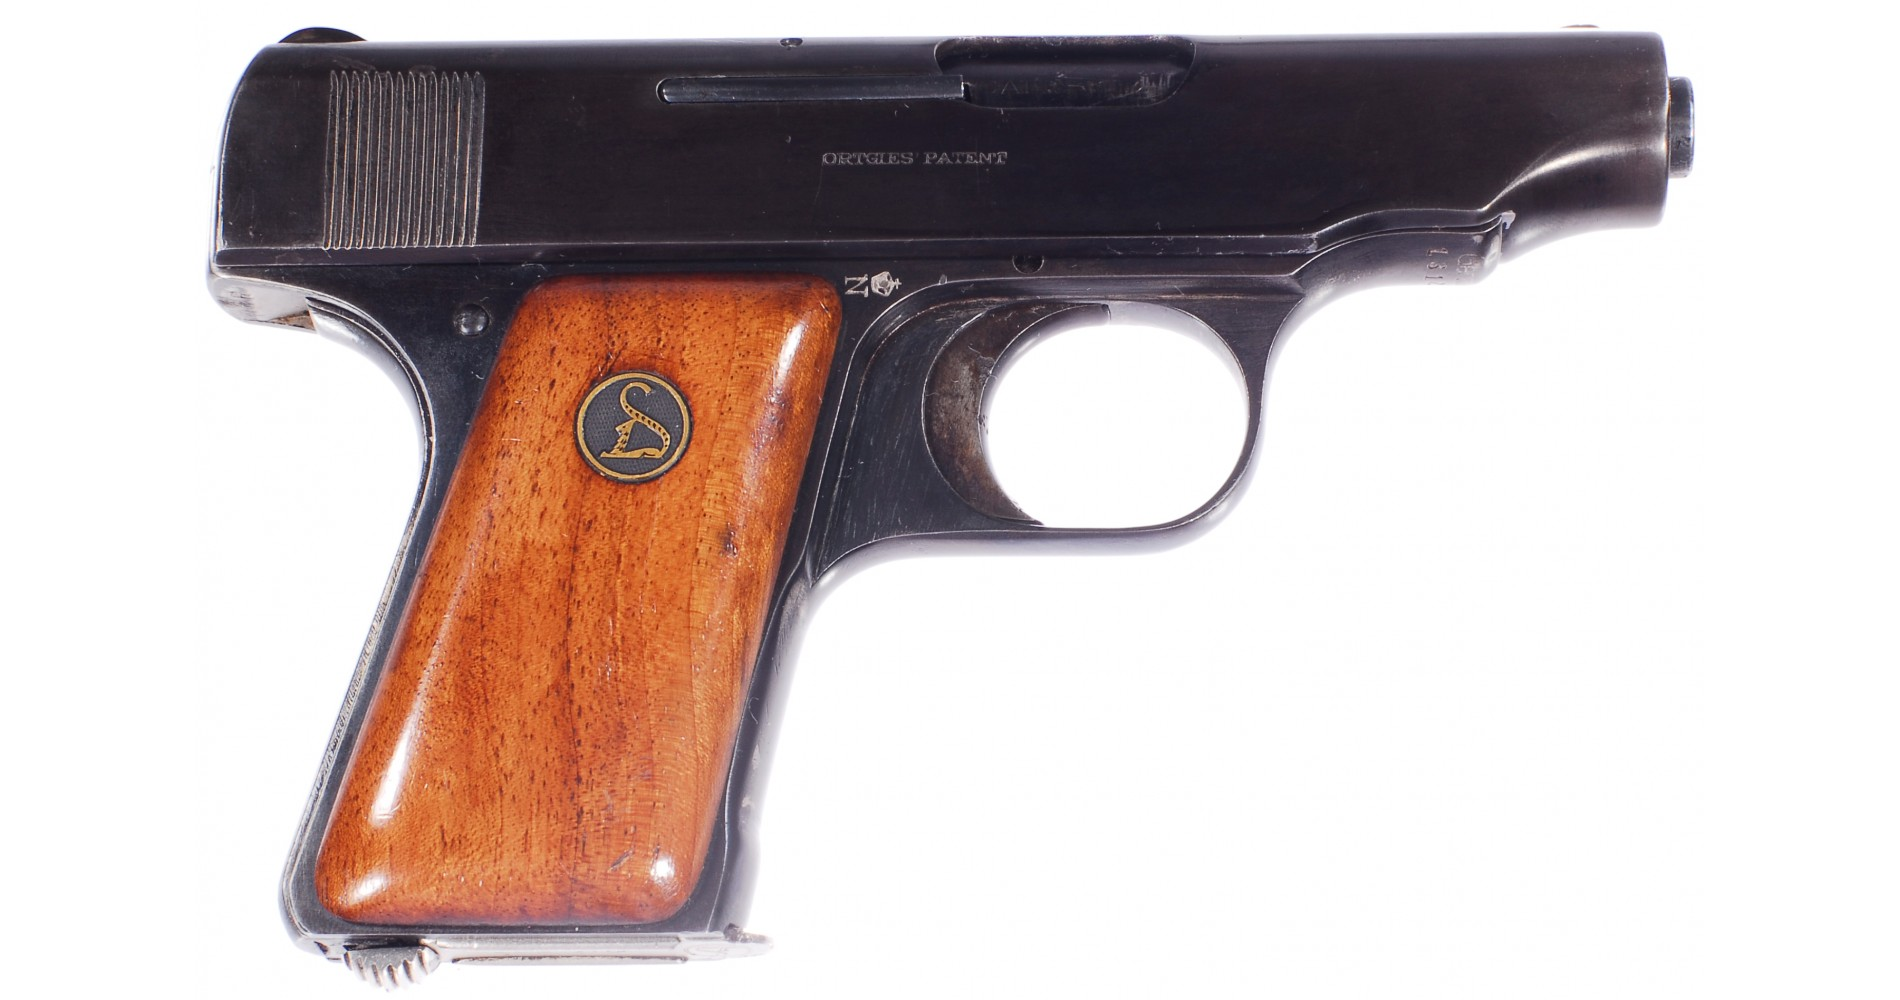 Pistole deutsche werke ortgies 6 35 mm br 2822 prodej zbran 237